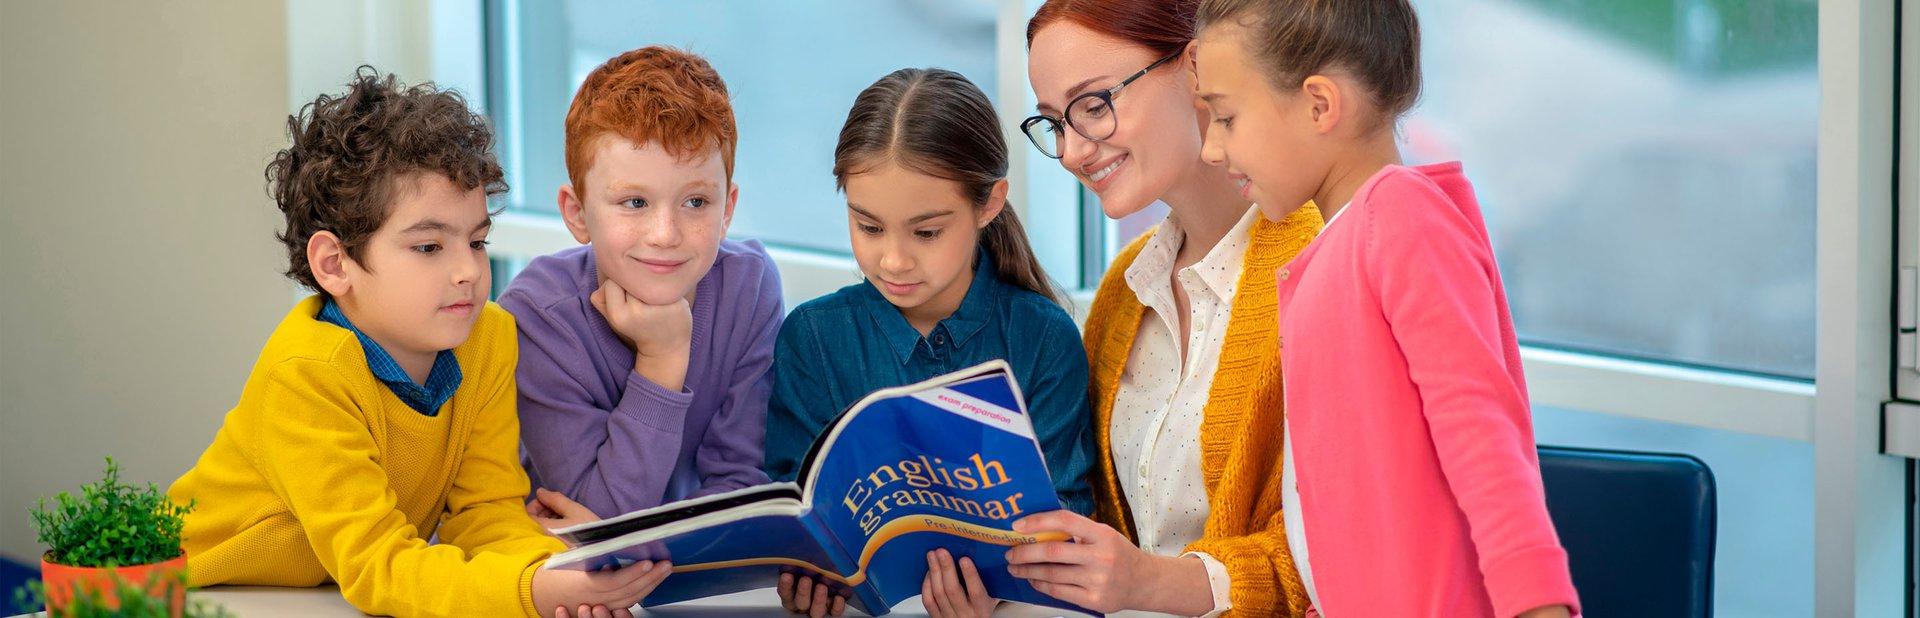 mención lengua extranjera inglés online